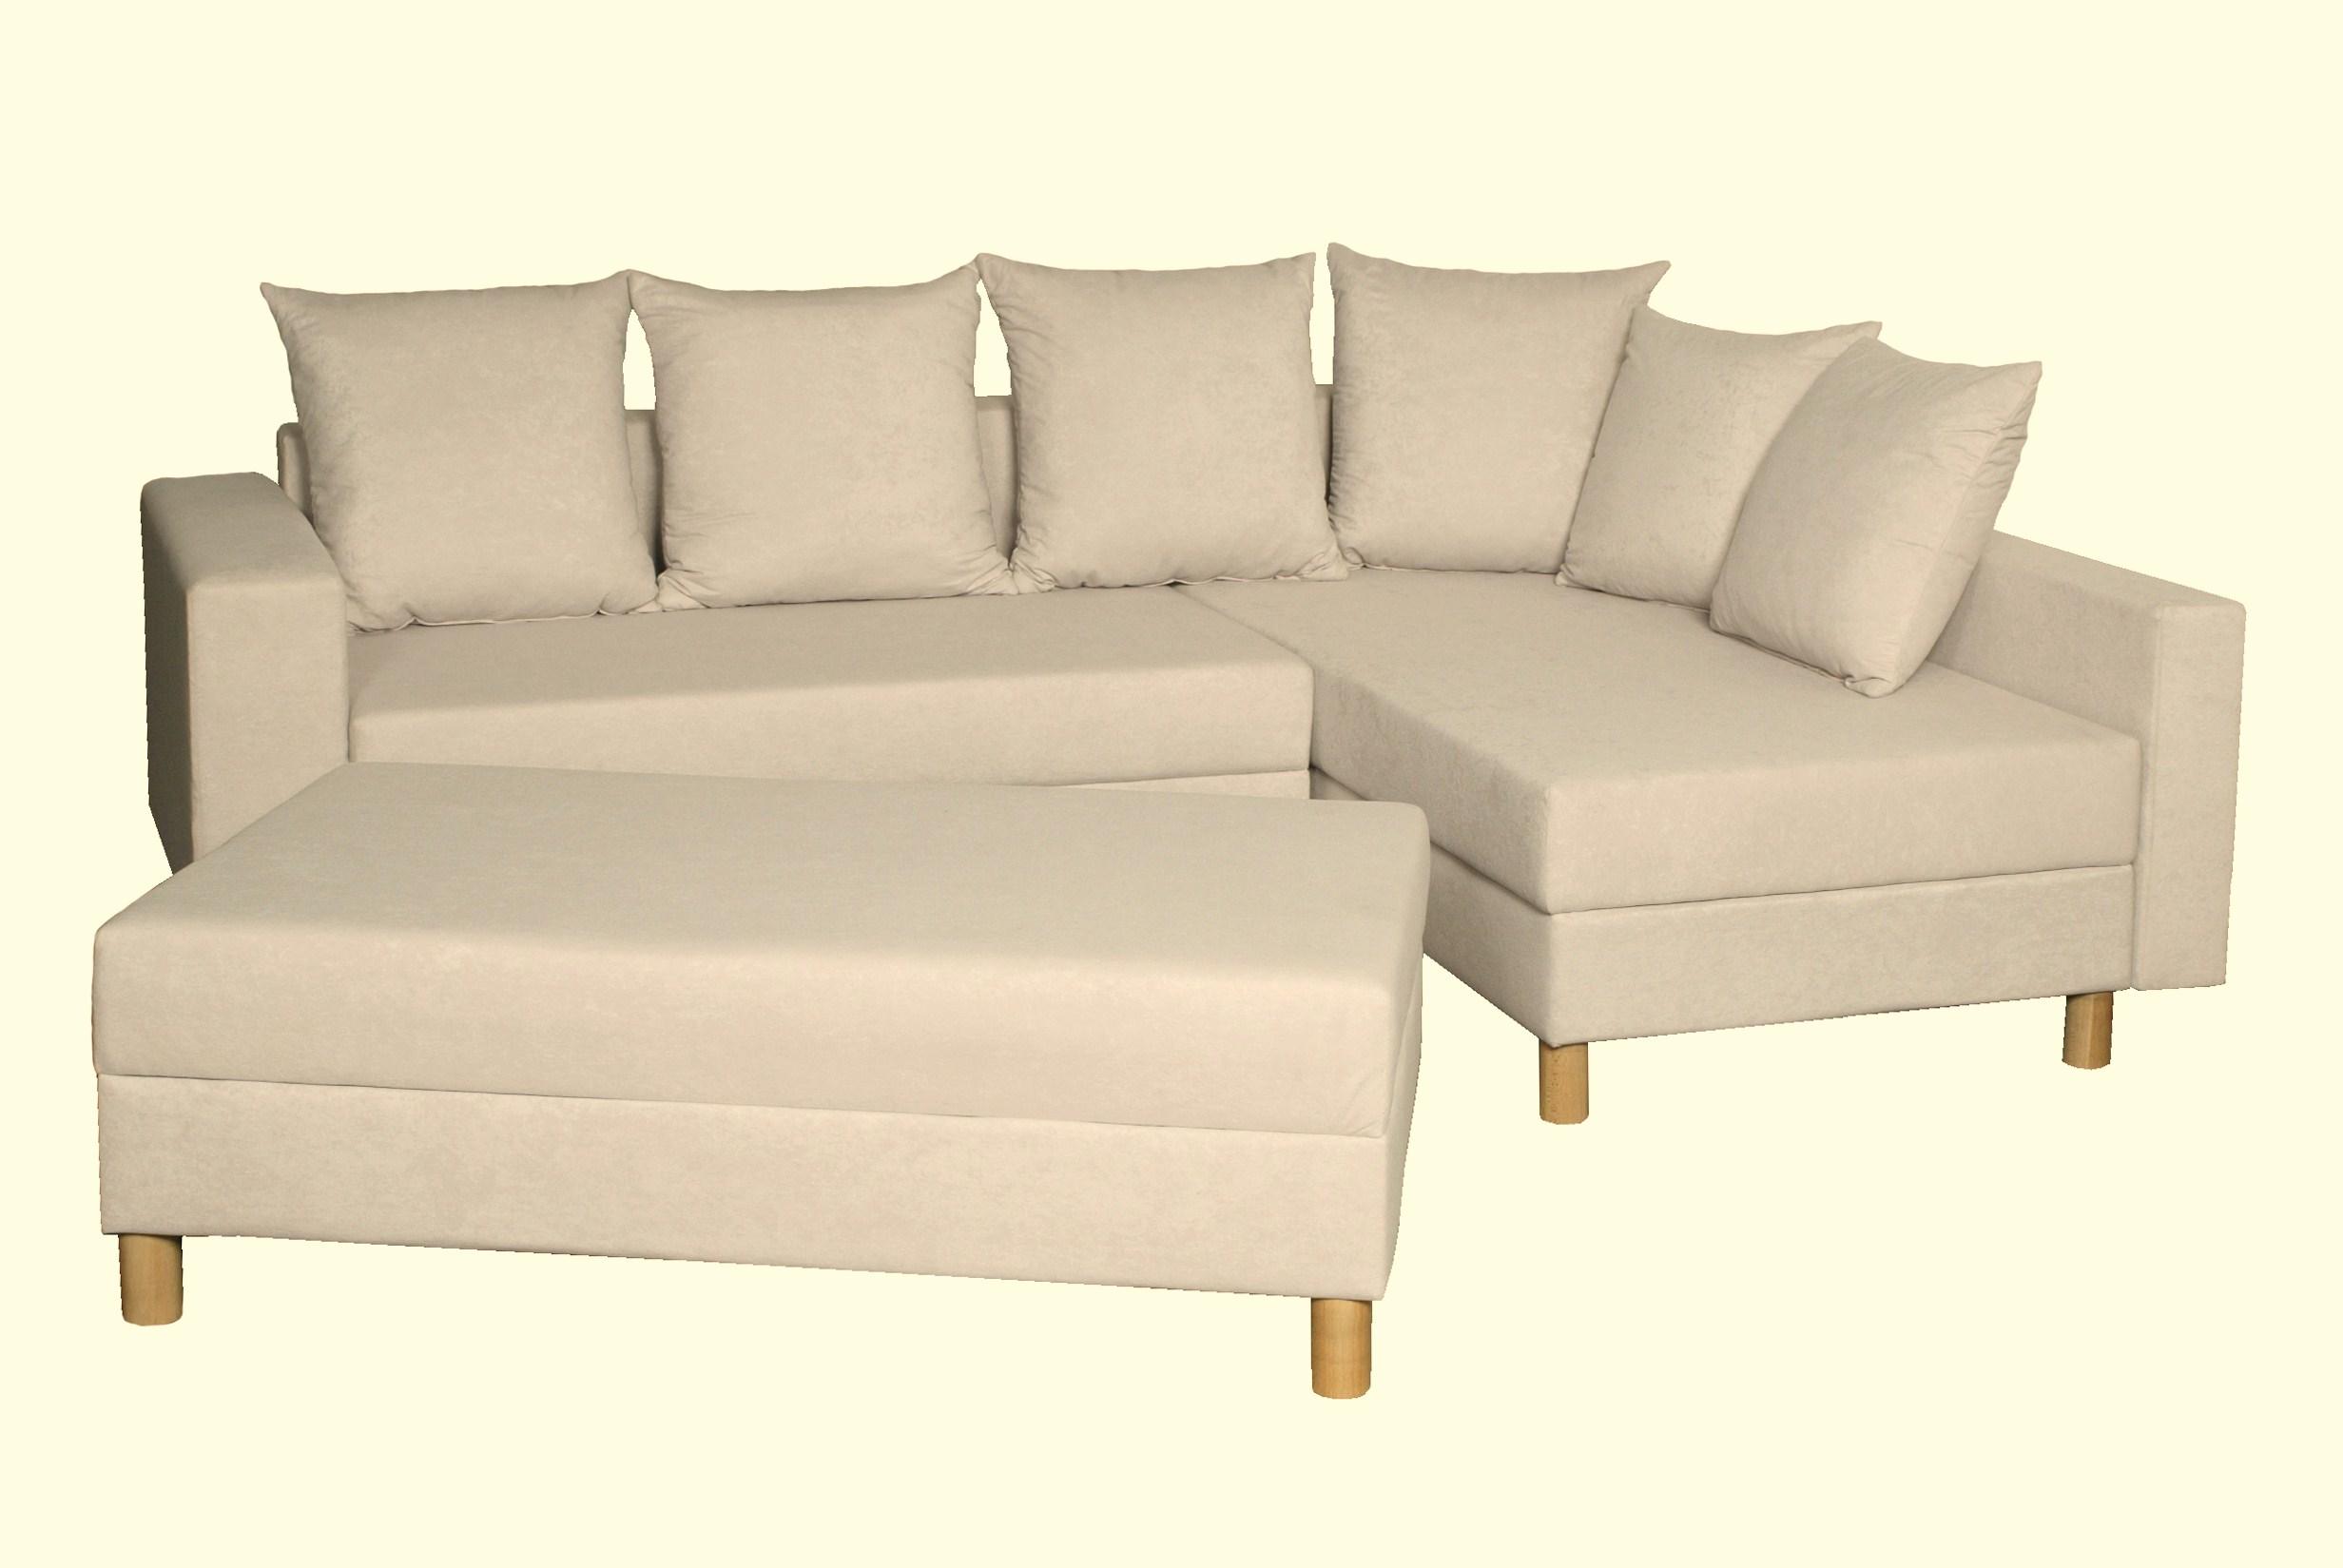 Canapé d'angle convertible réversible & pouf  DINO